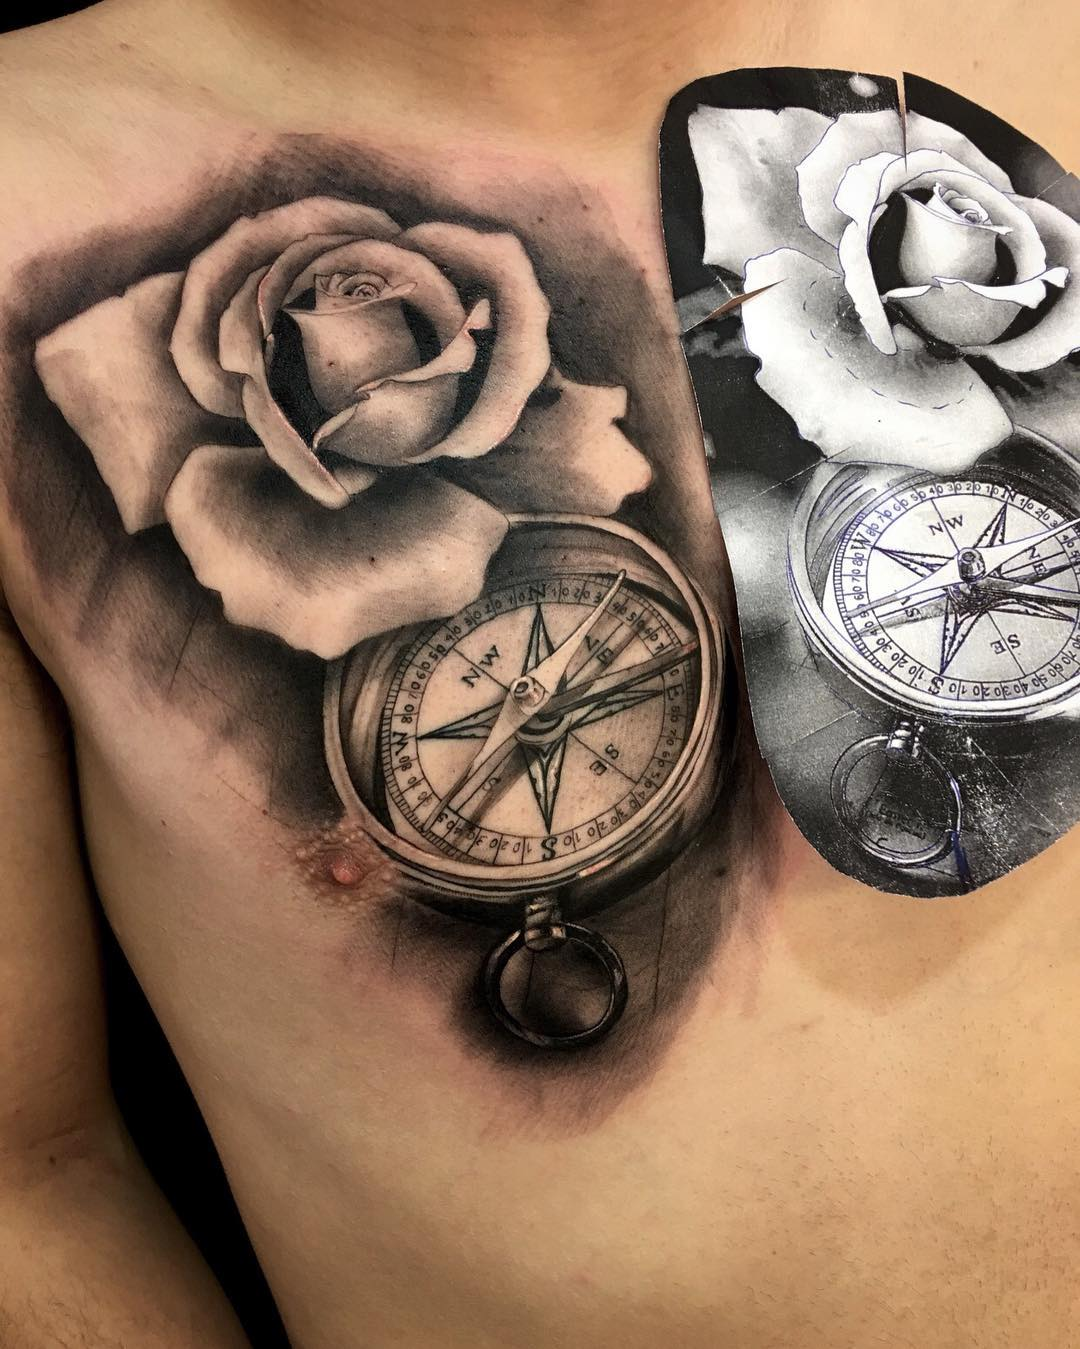 followforfollow,followme,follow,ciudadreal,tattoos,ciudadrealtattoo,tattooshop,tattooers,besttattooers,juantabasco,ciudadrealsetatua,ink,inkmaster,tatuajes,realismo,realistictattoo,bestshoptattoo,follow,ciudadrealtattoo,trap,trapmusic,traptattoo,traditionaltattoos,oldwork,inked,inkedlife,inkedsociety,art,amazingink,tattooart,oldlines,oldschooltattoo